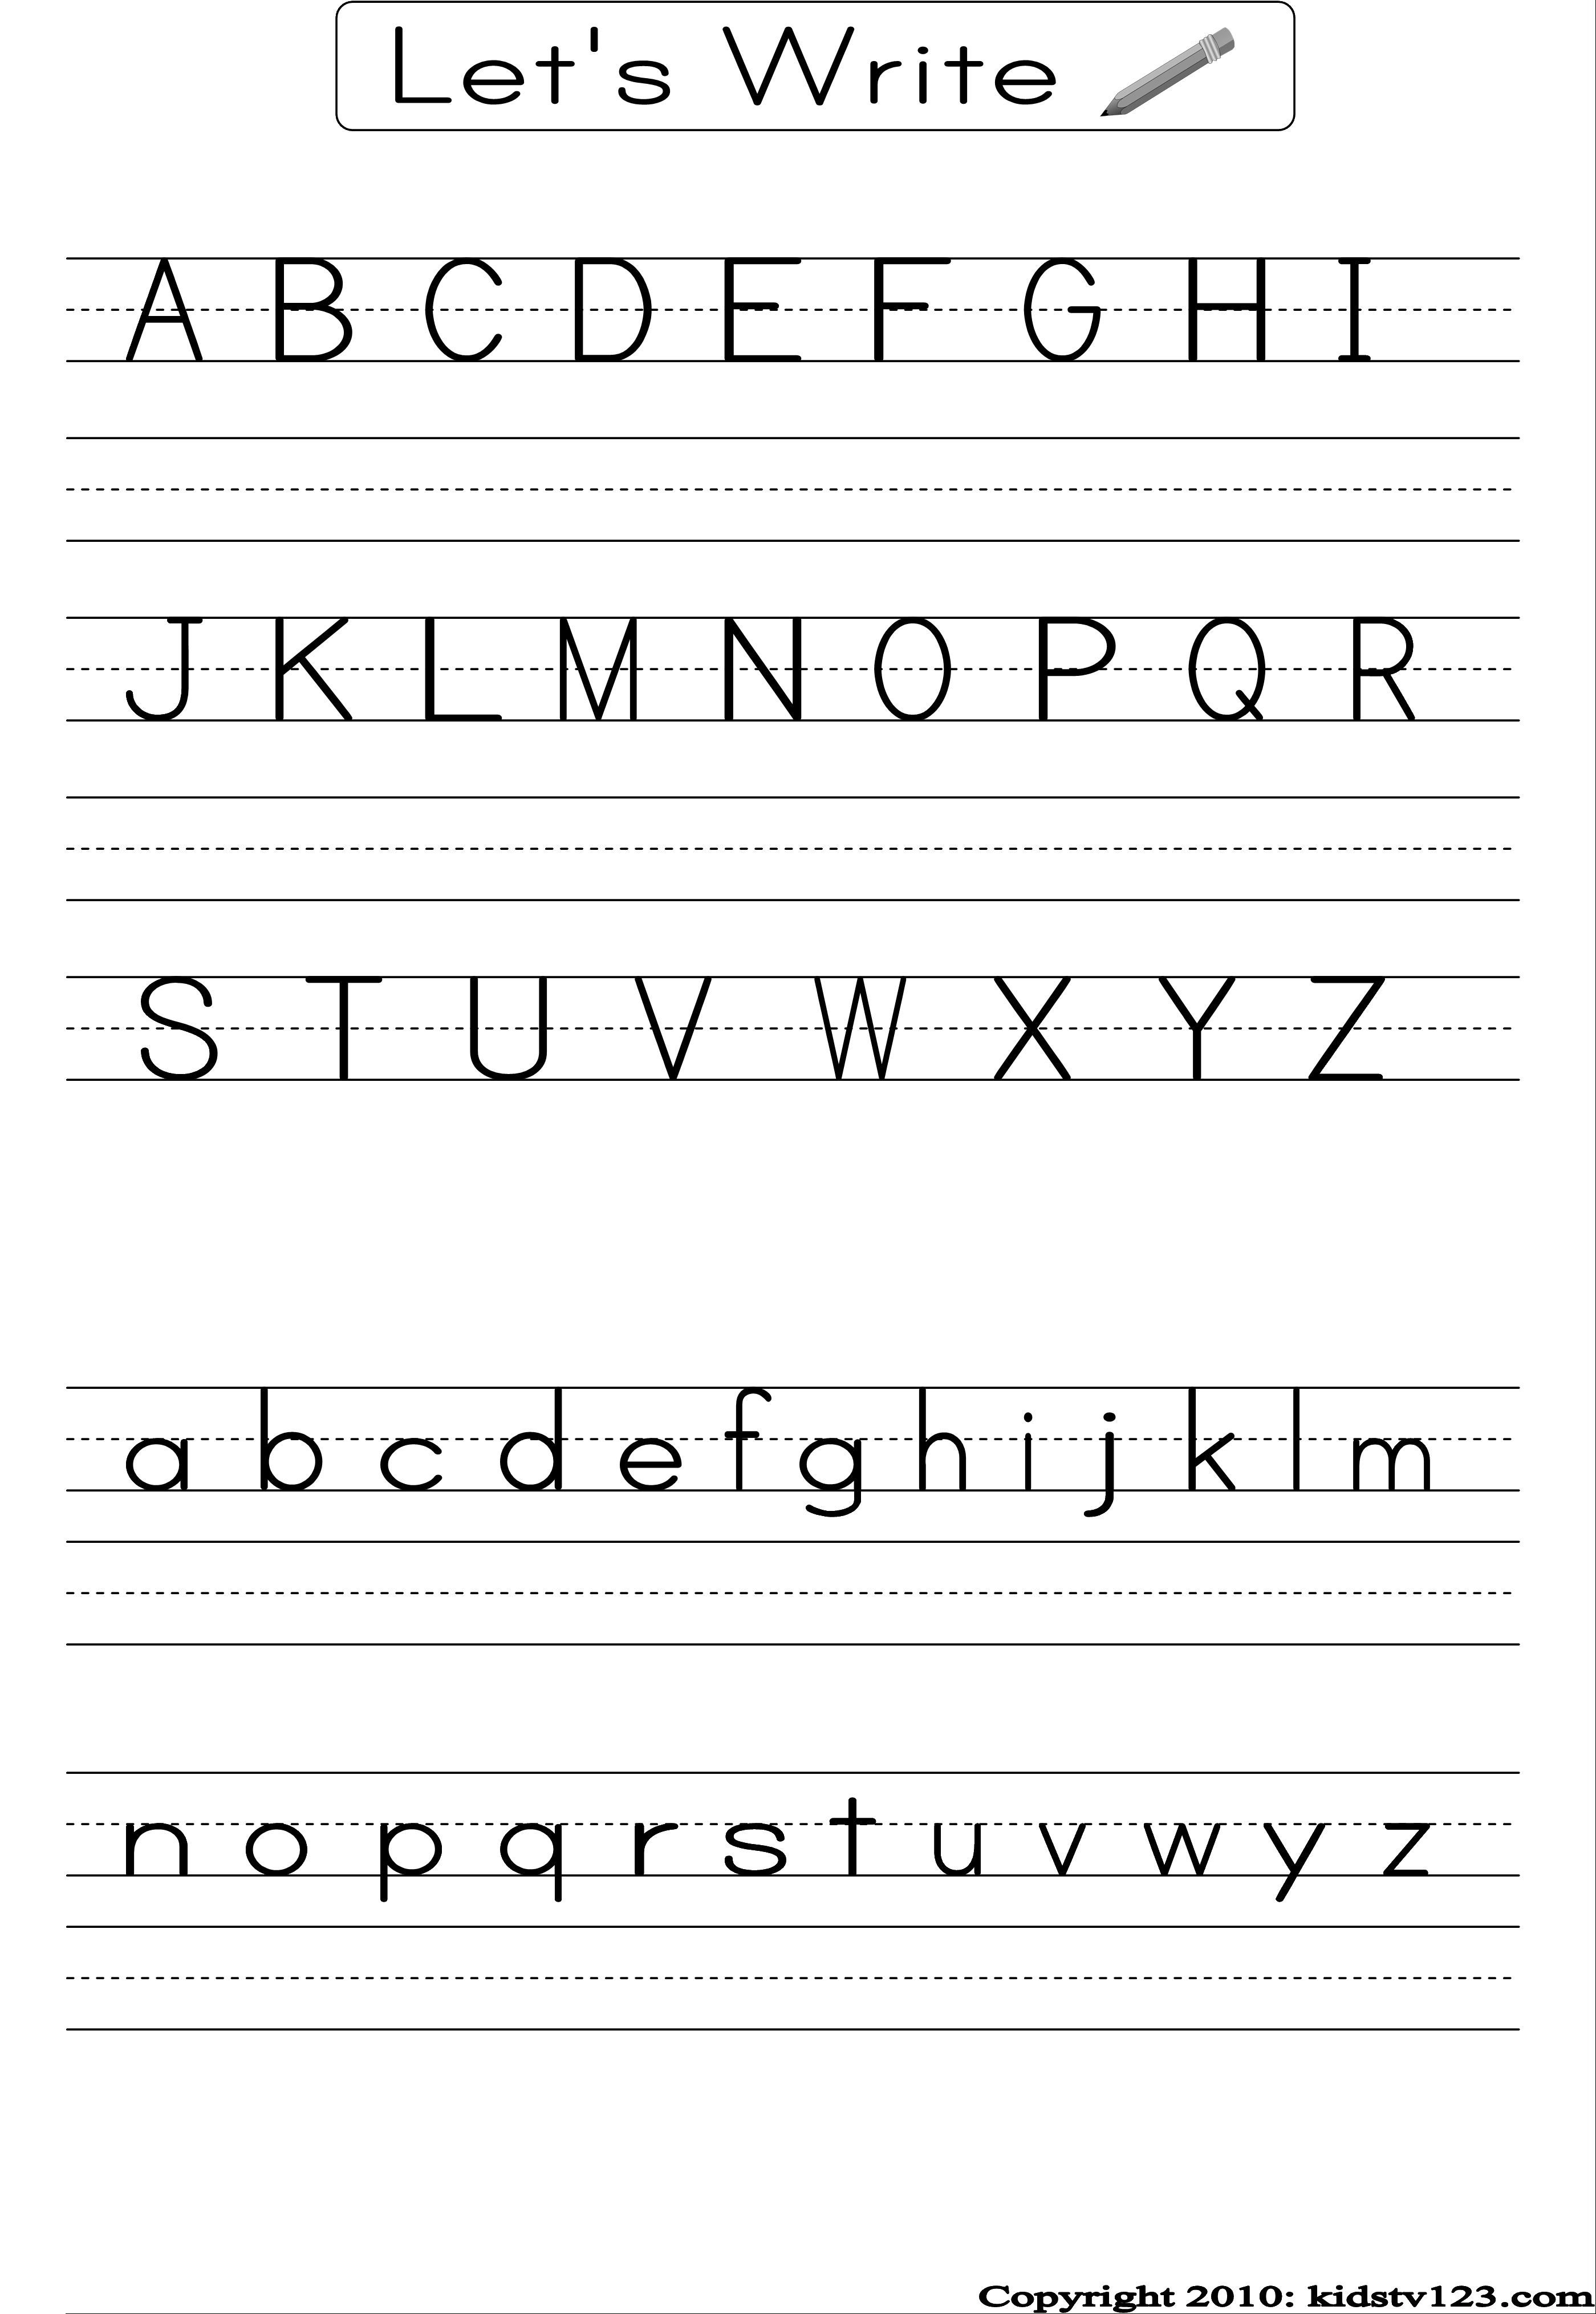 Free Printable Alphabet Worksheets, Preschool Writing And Pattern - Free Printable Alphabet Pages